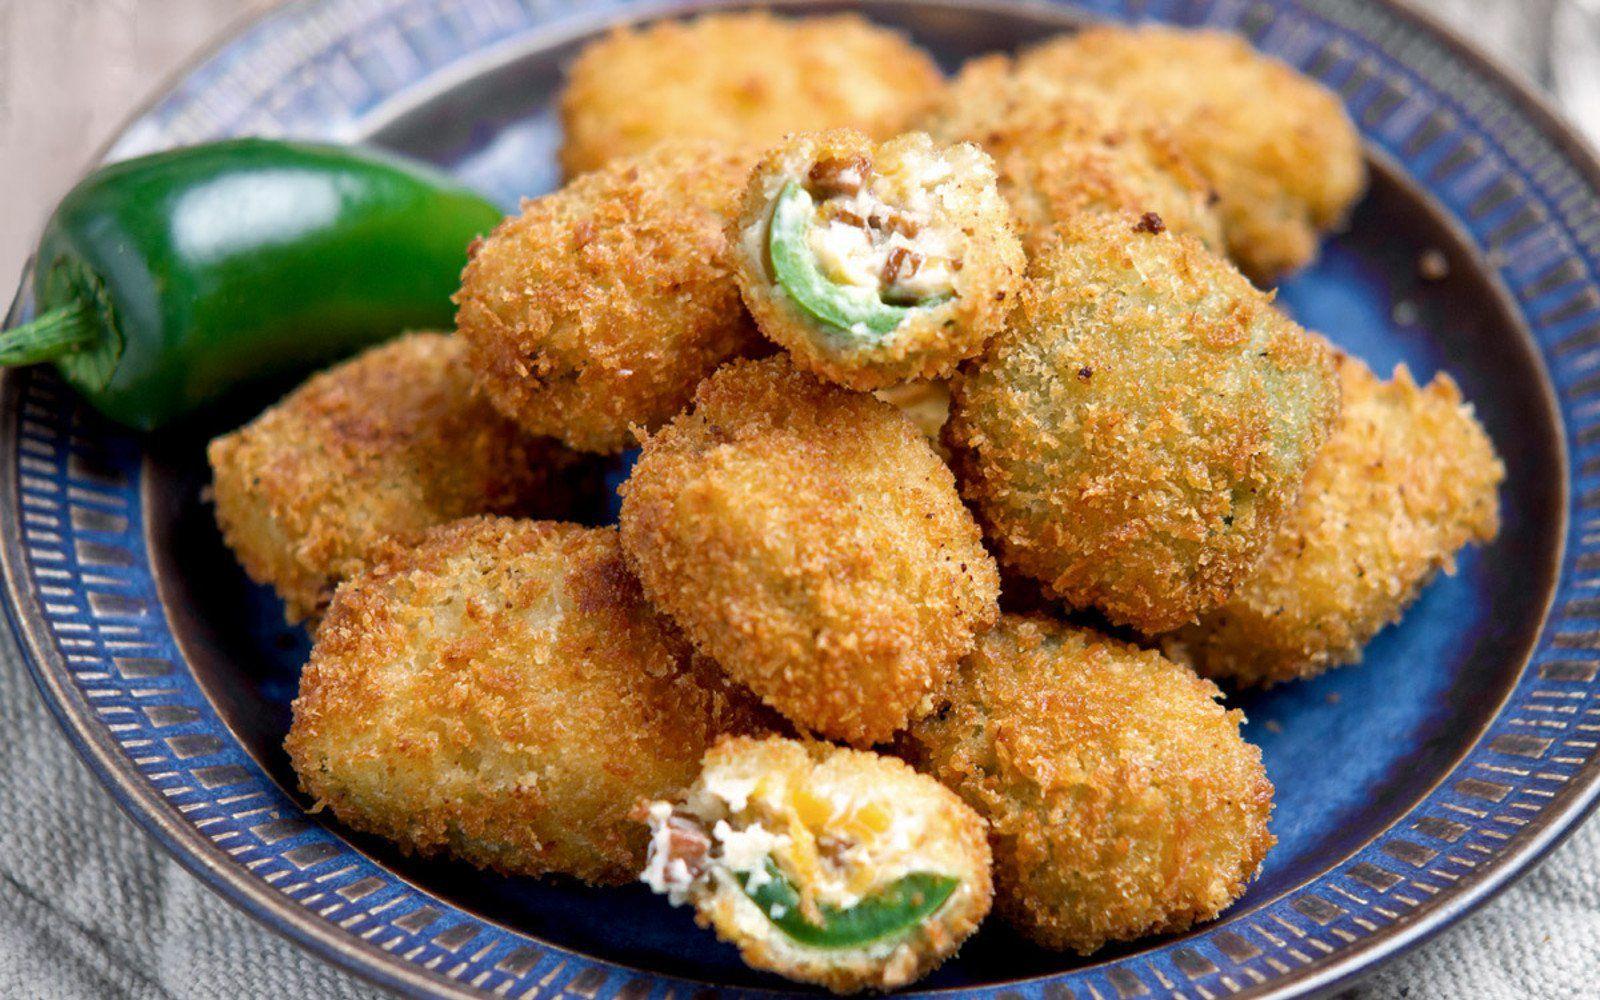 vegan food in roanoke va